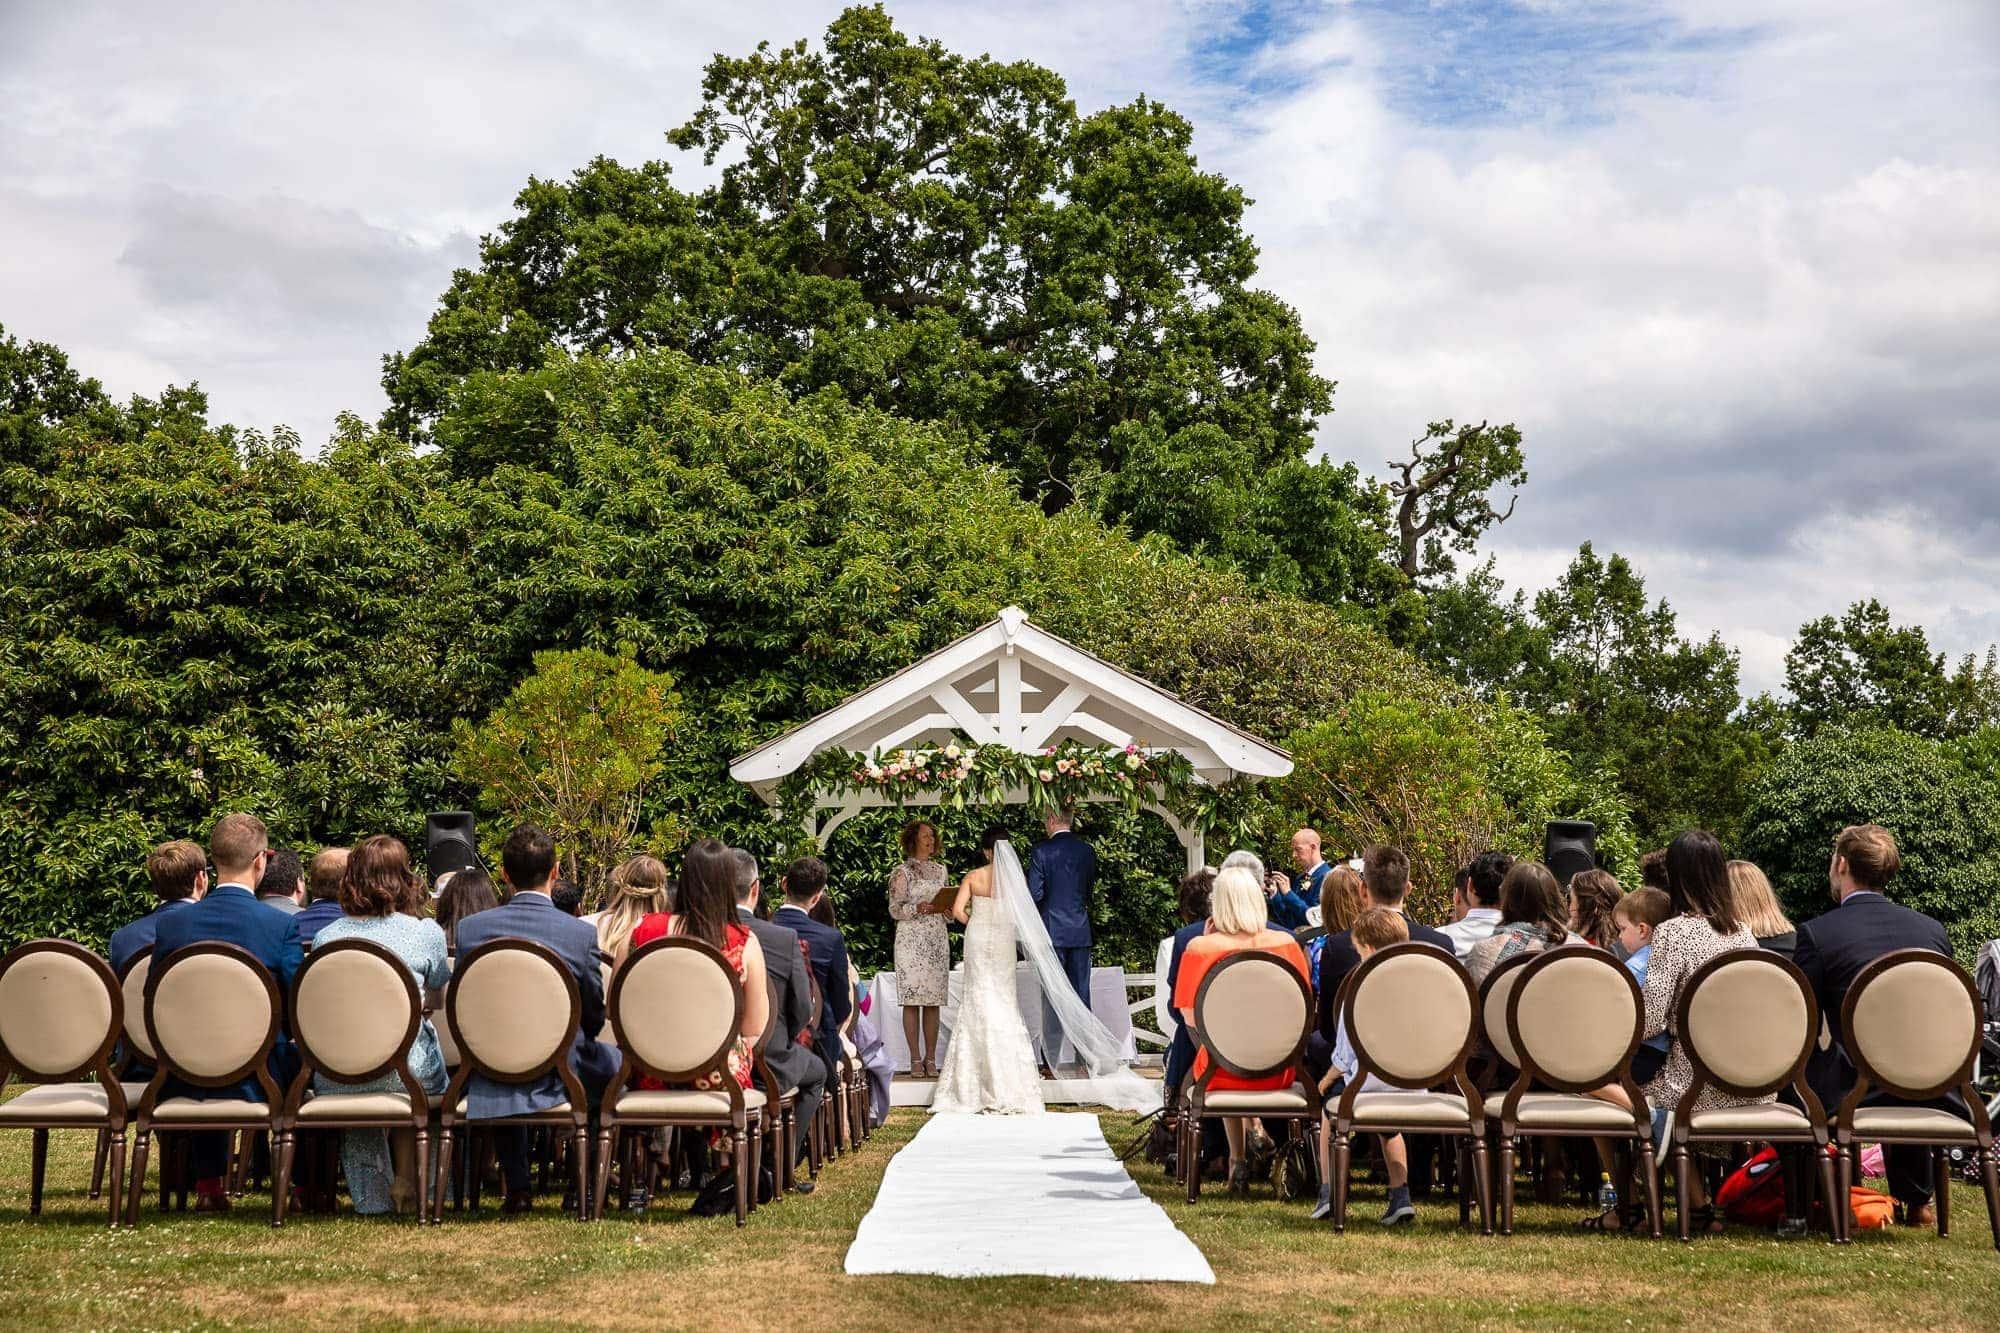 De Vere Wokefield Wedding outdoor ceremony